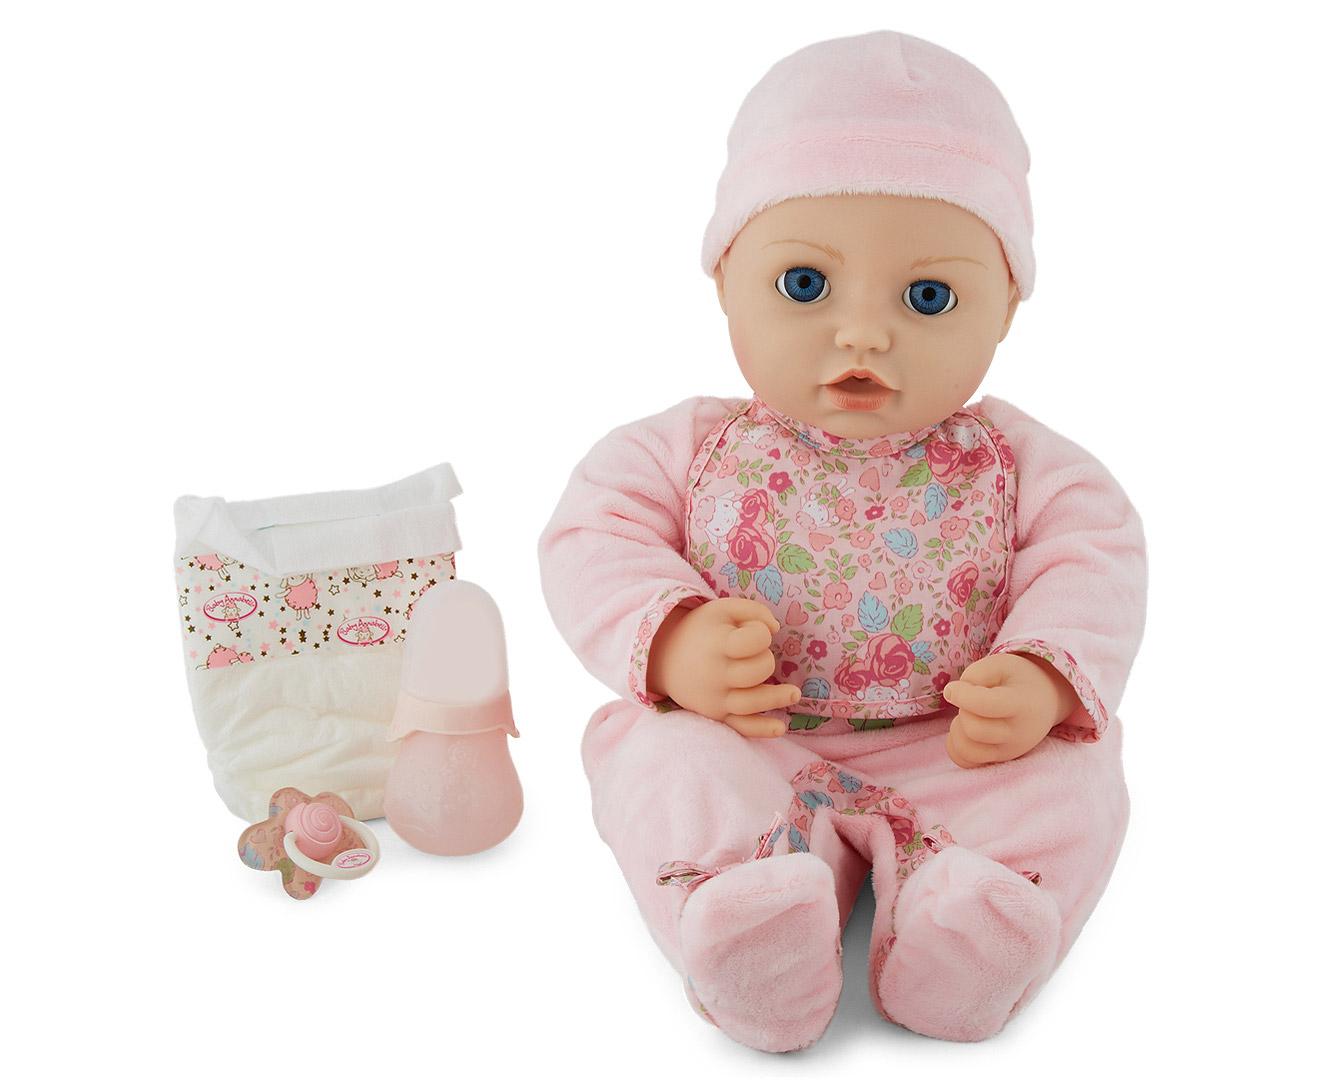 Baby Annabell Doll 4001167794401 Ebay